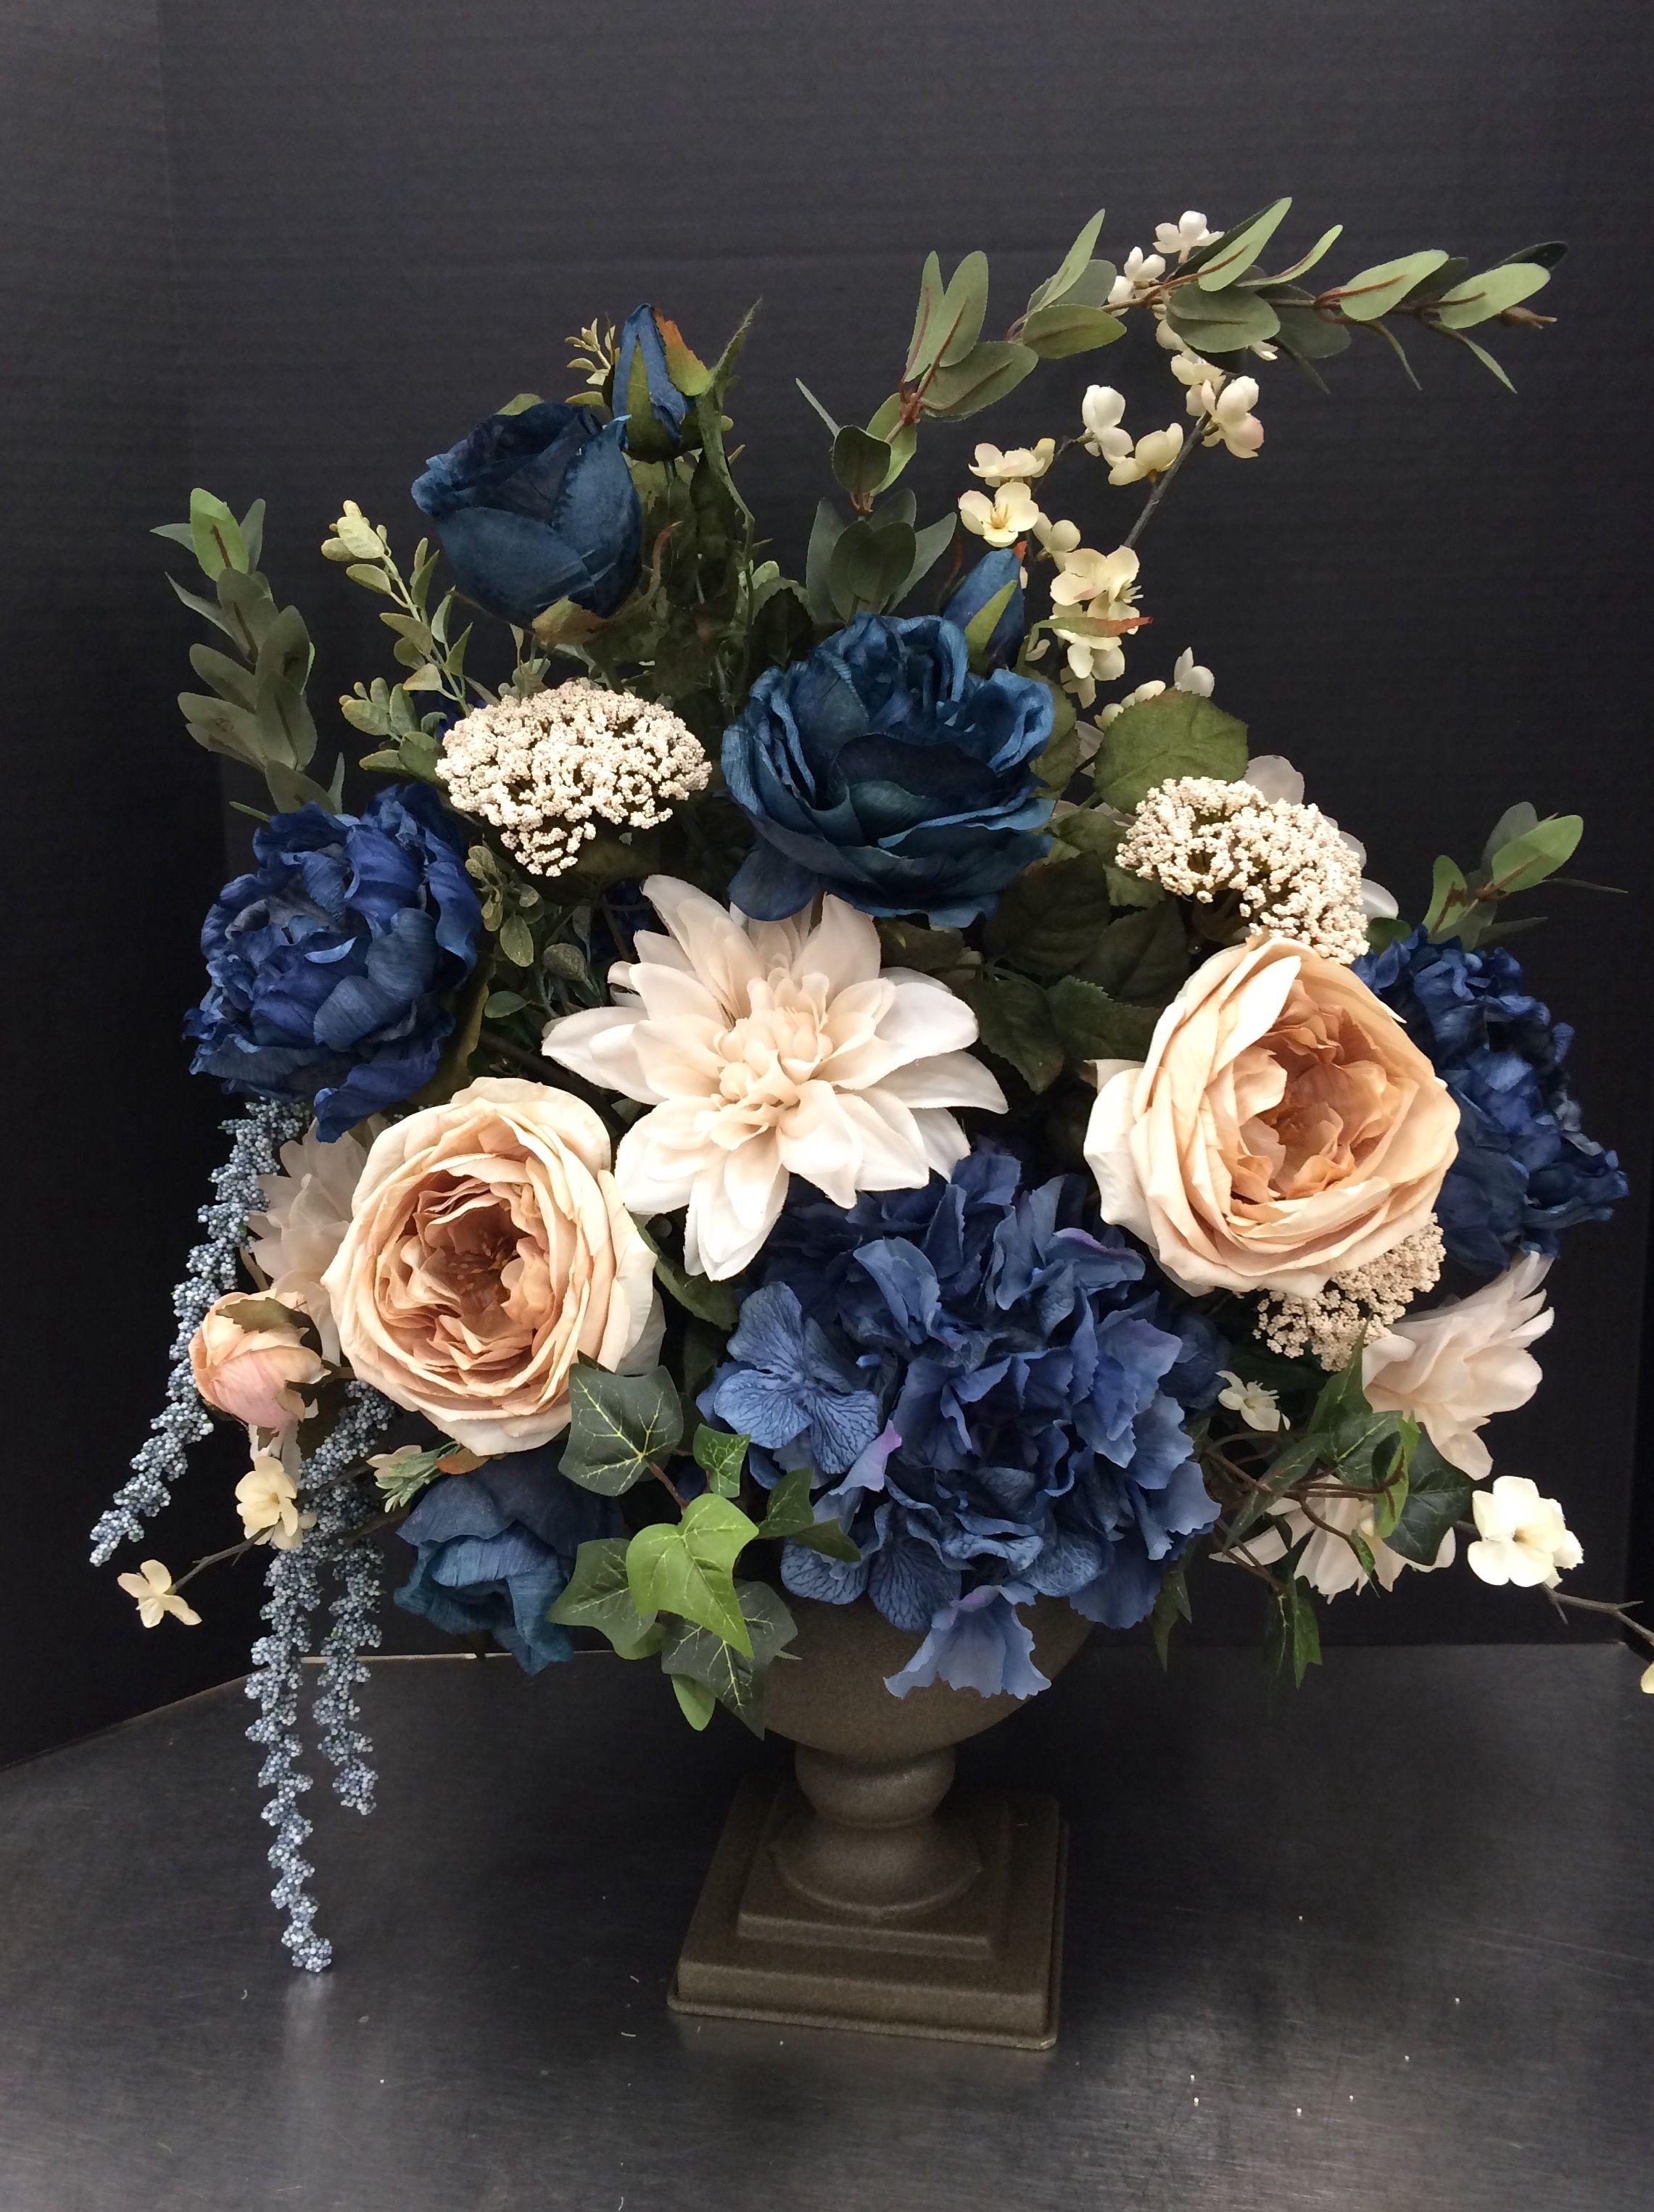 Blue And Cream Silk Floral Arrangement Fake Flower Arrangements Blue Flower Arrangements Flower Arrangements Diy